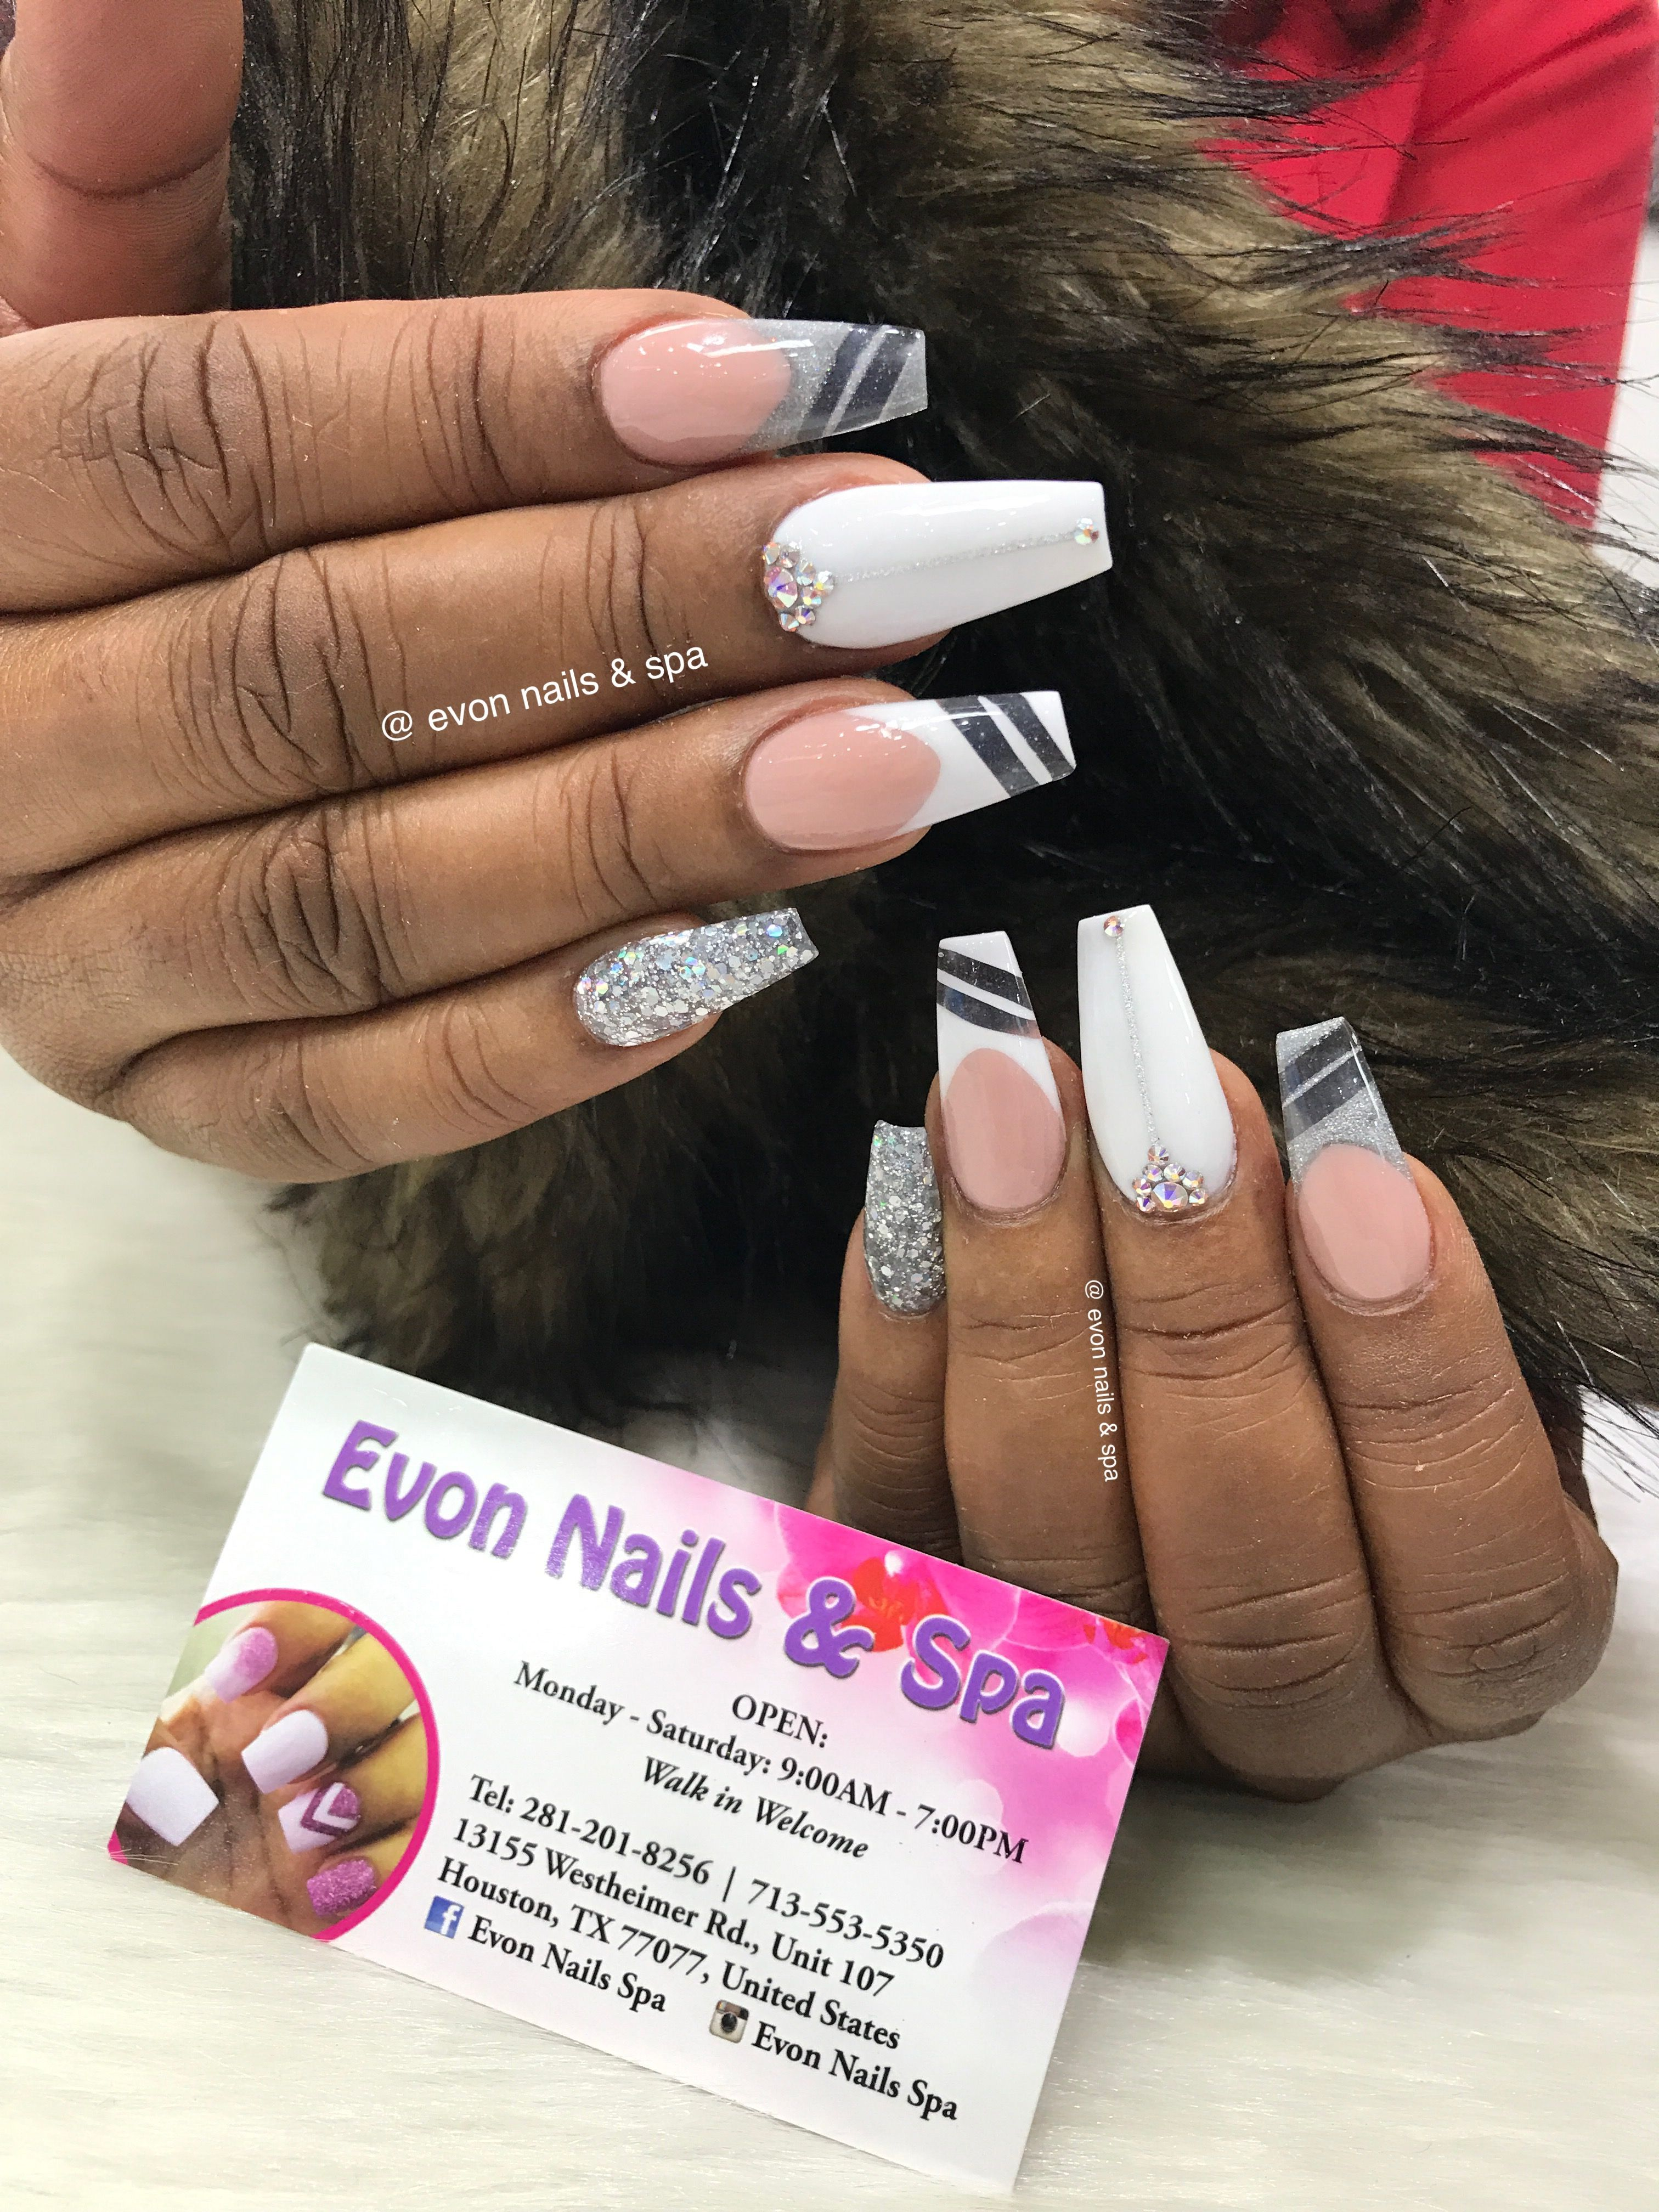 Pin By Evon Nails Spa On Evon Nails Spa Instagram Evon Nails Spa Facebook Evon Nails Nail Spa Nails Spa